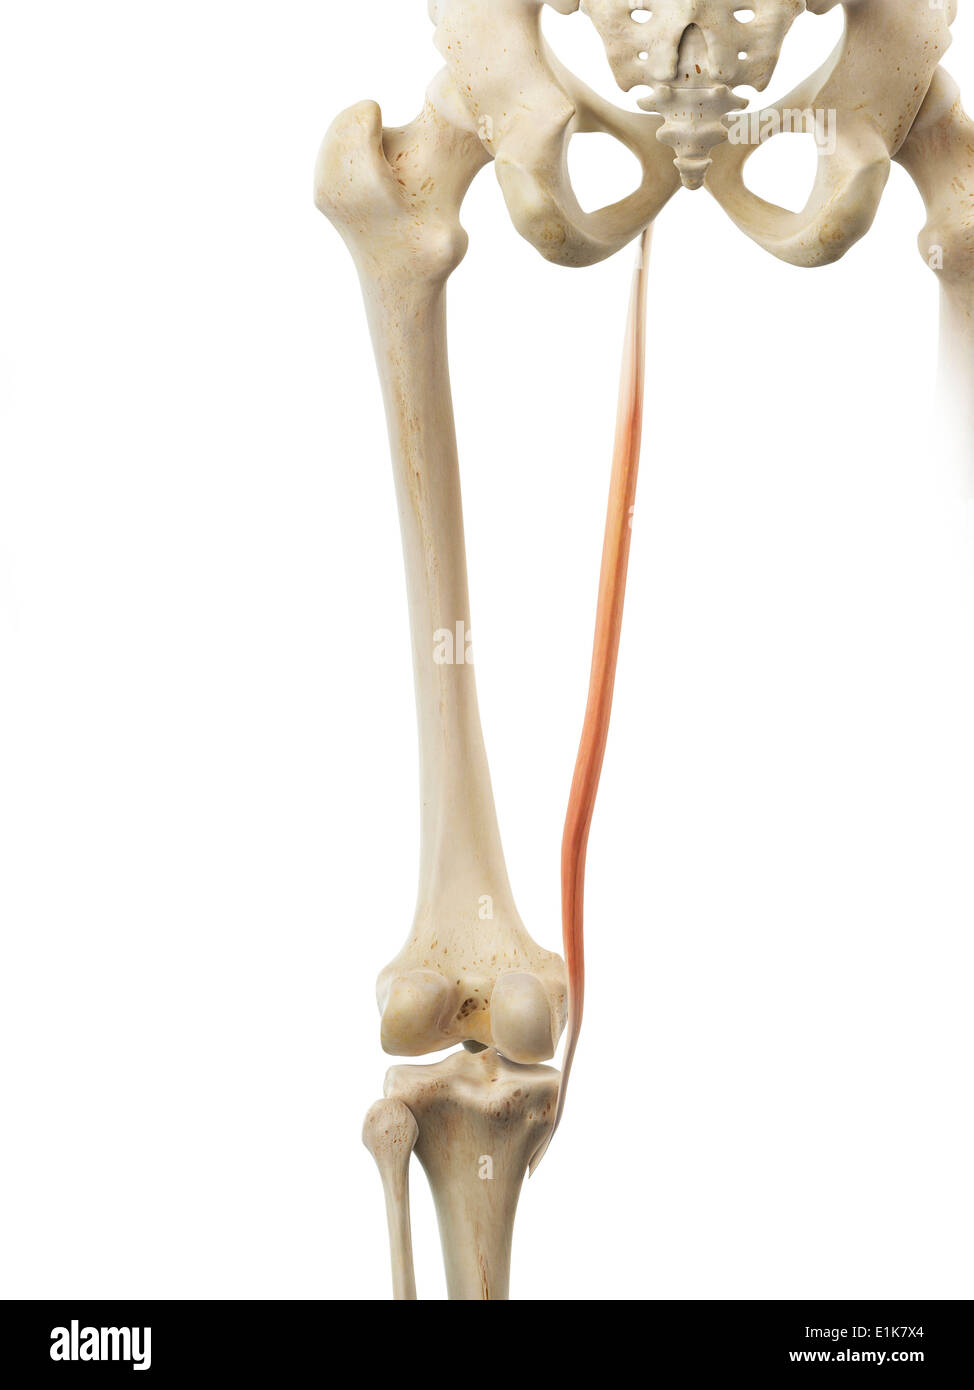 Human Gracilis Muscle Computer Artwork Stock Photo 69879436 Alamy